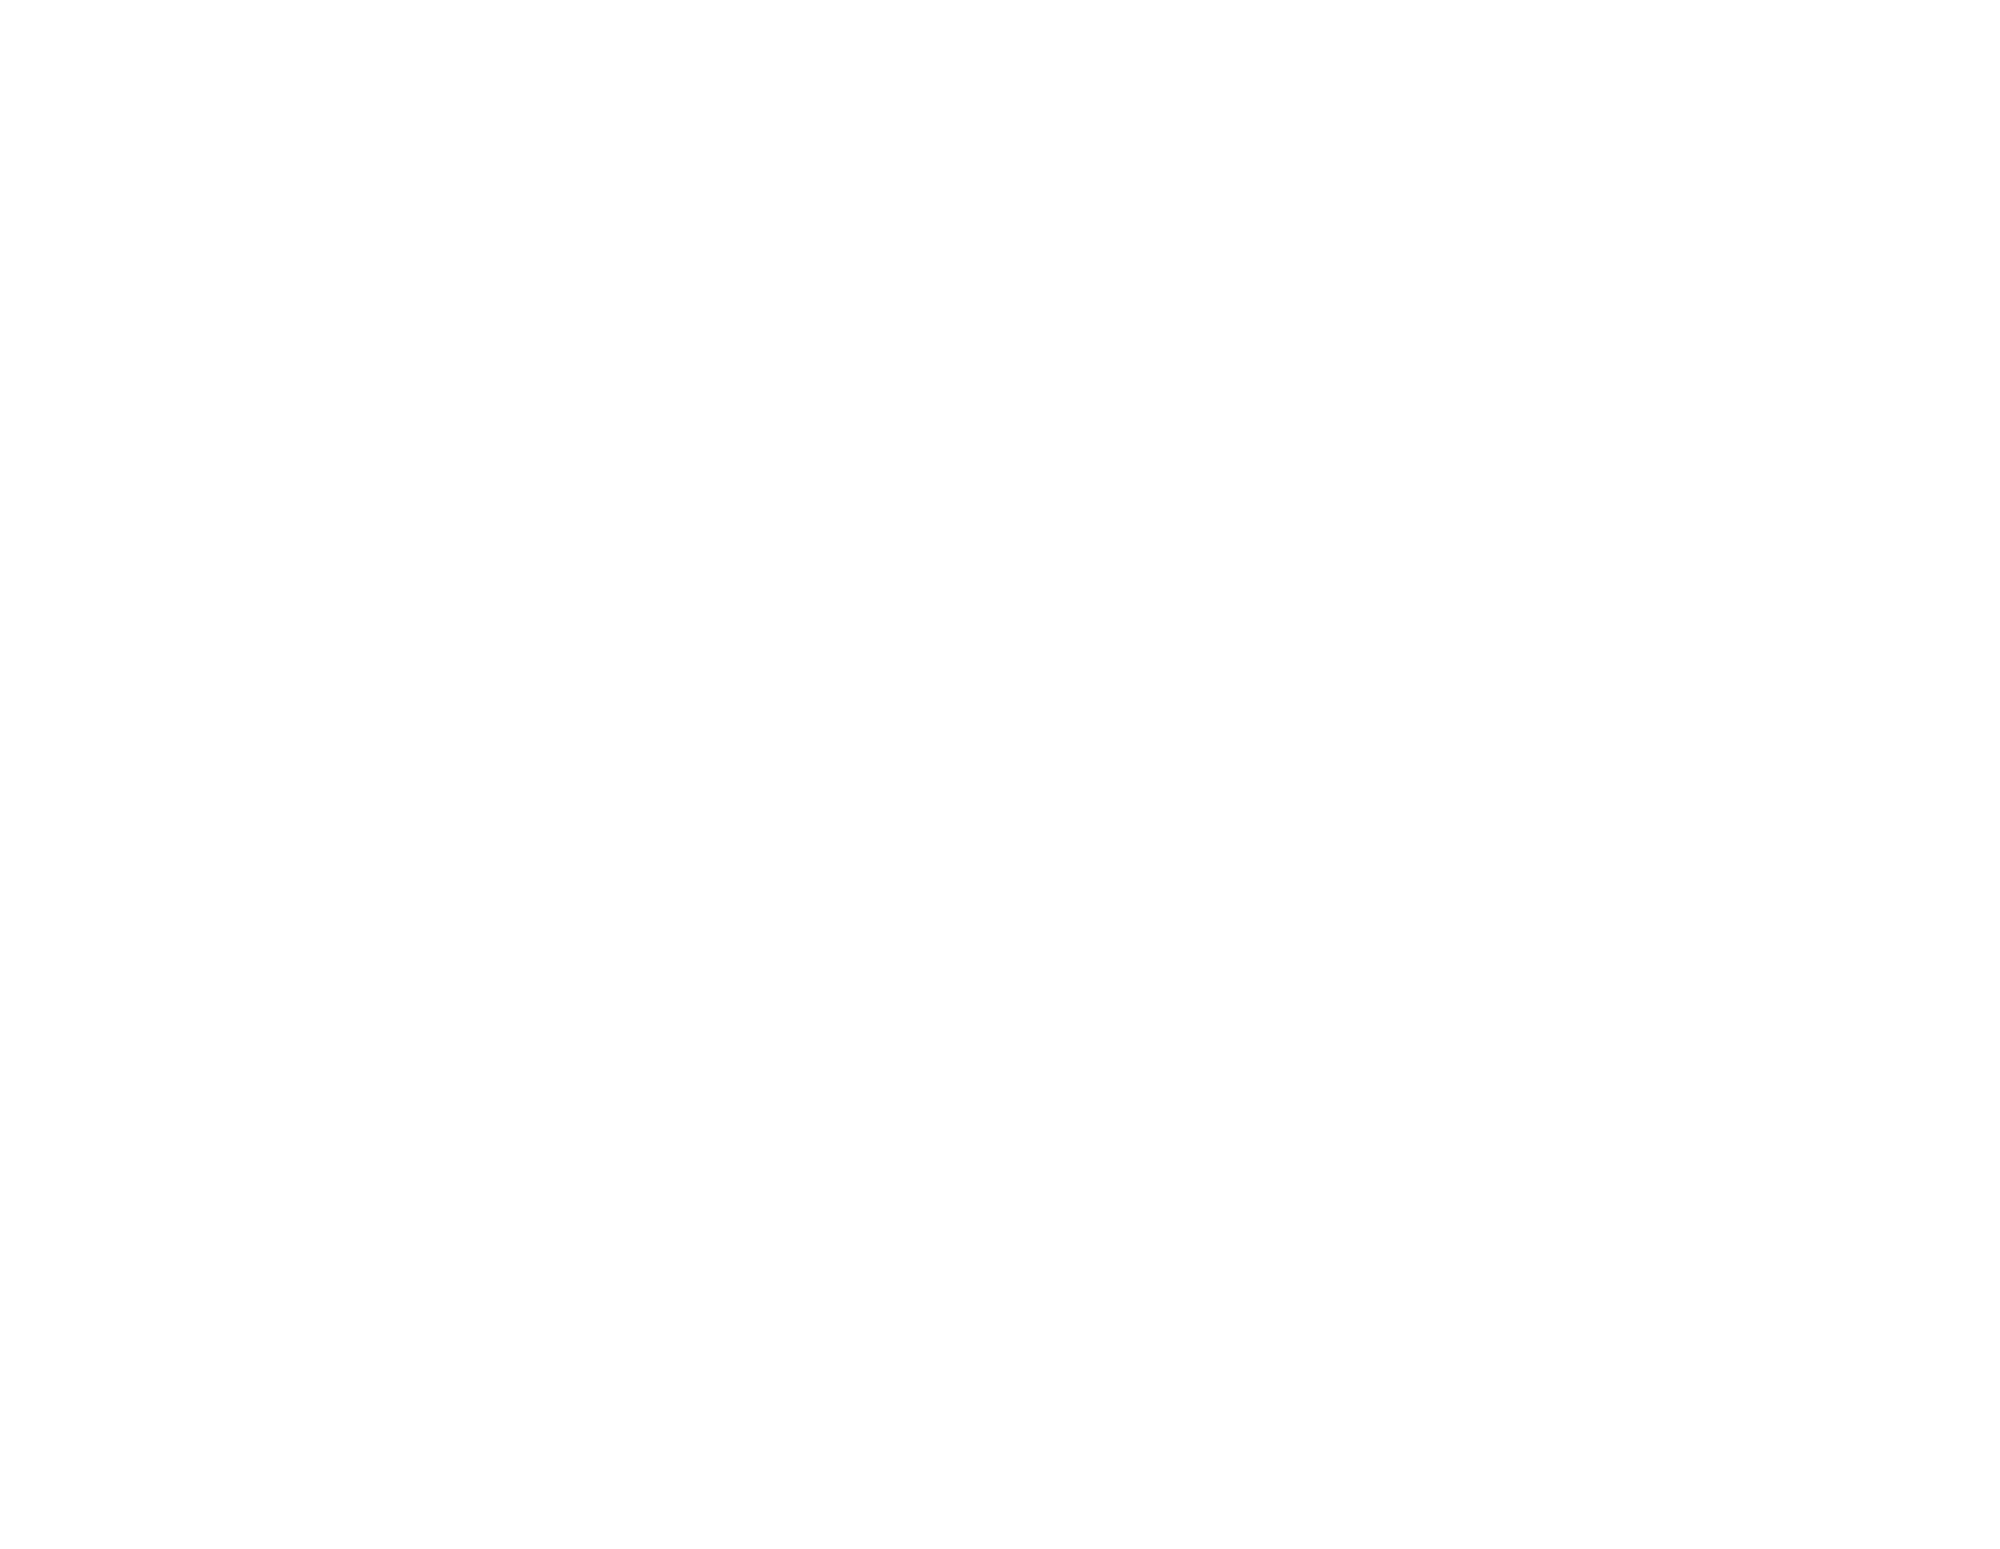 Shampoo clipart salon. The uber great bentley